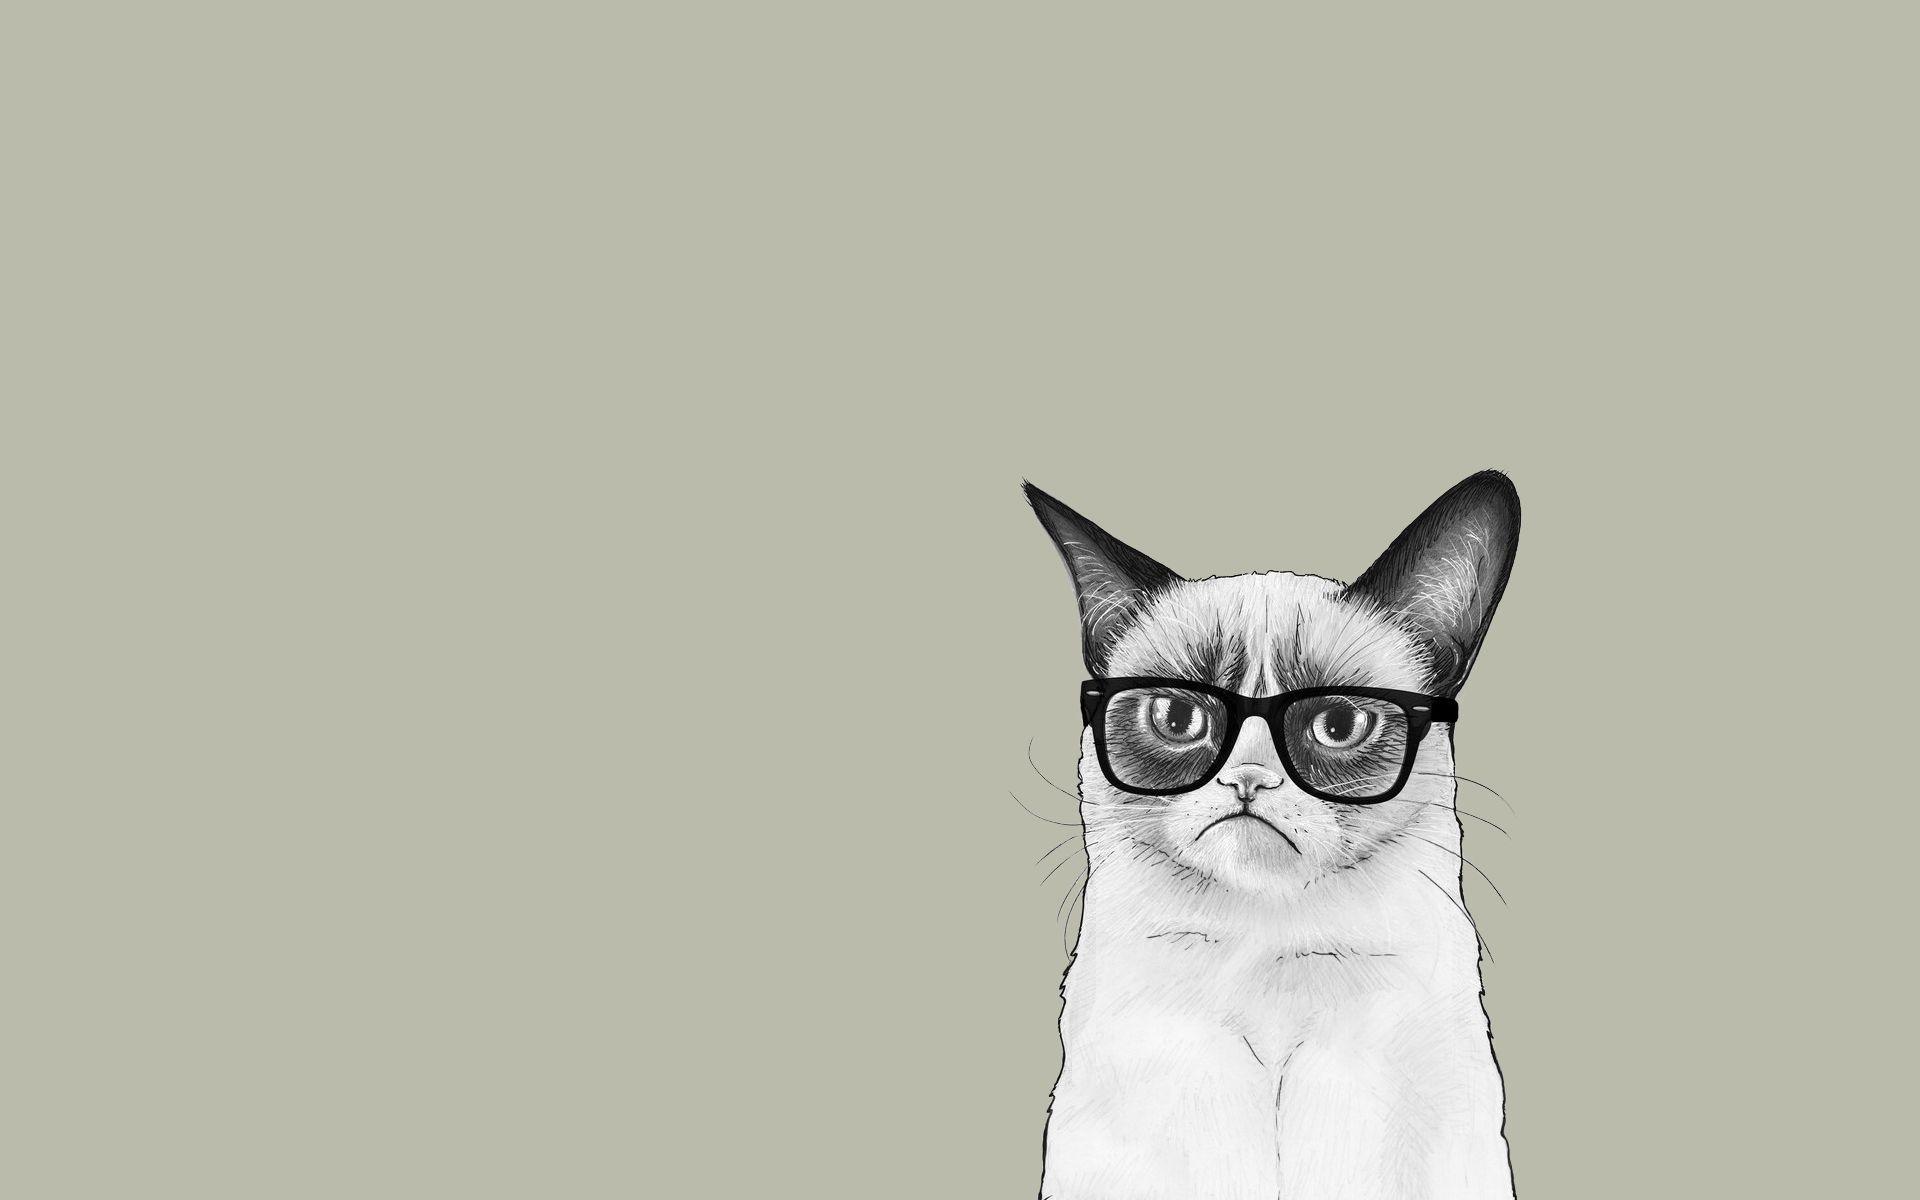 Minimalist Wallpaper Grumpy Cat Desktop Wallpaper Art Minimalist Wallpaper Cartoon Wallpaper